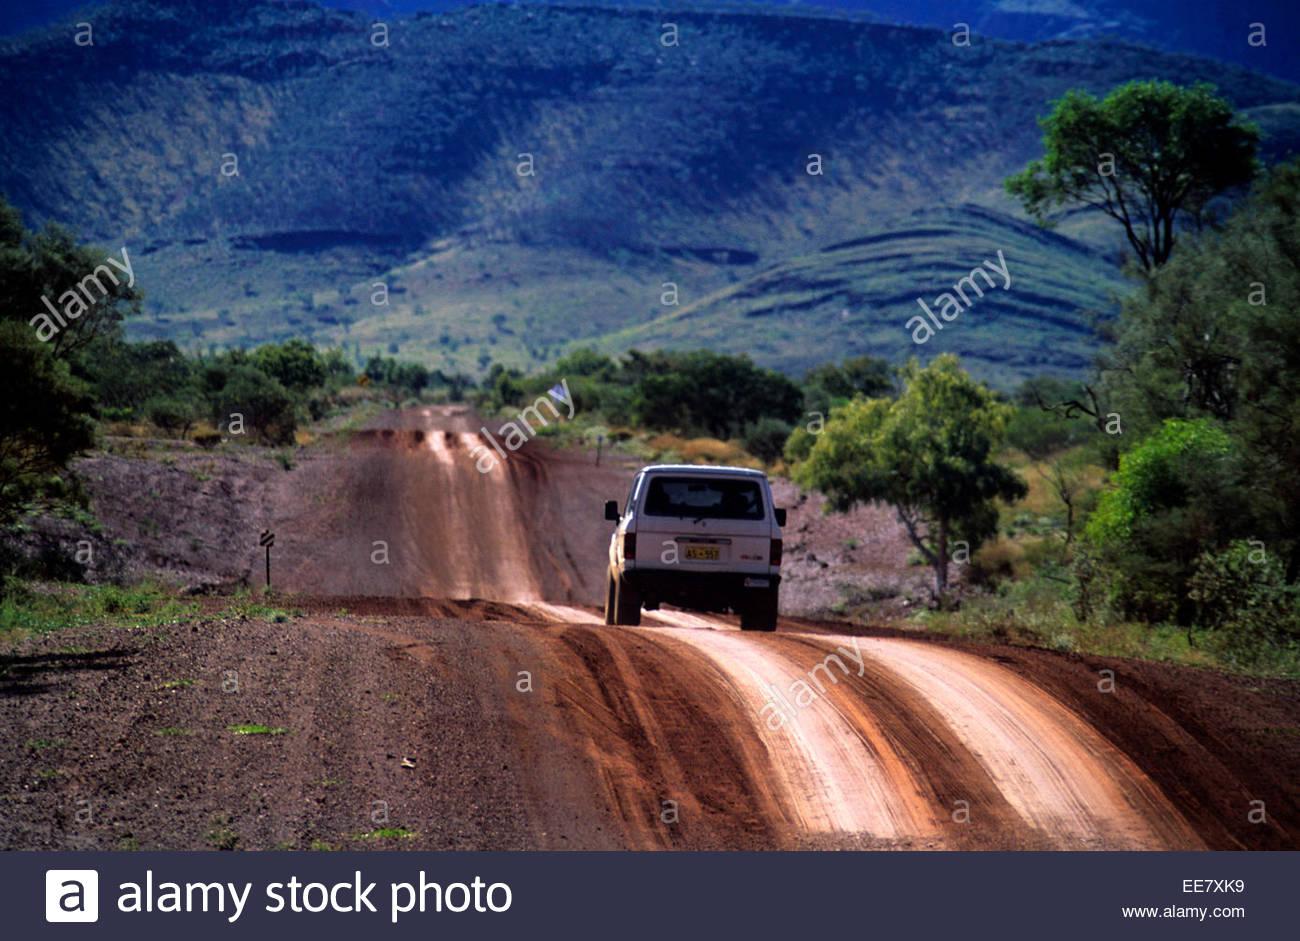 A jeep in the Karijini National Park, Australia. - Stock Image